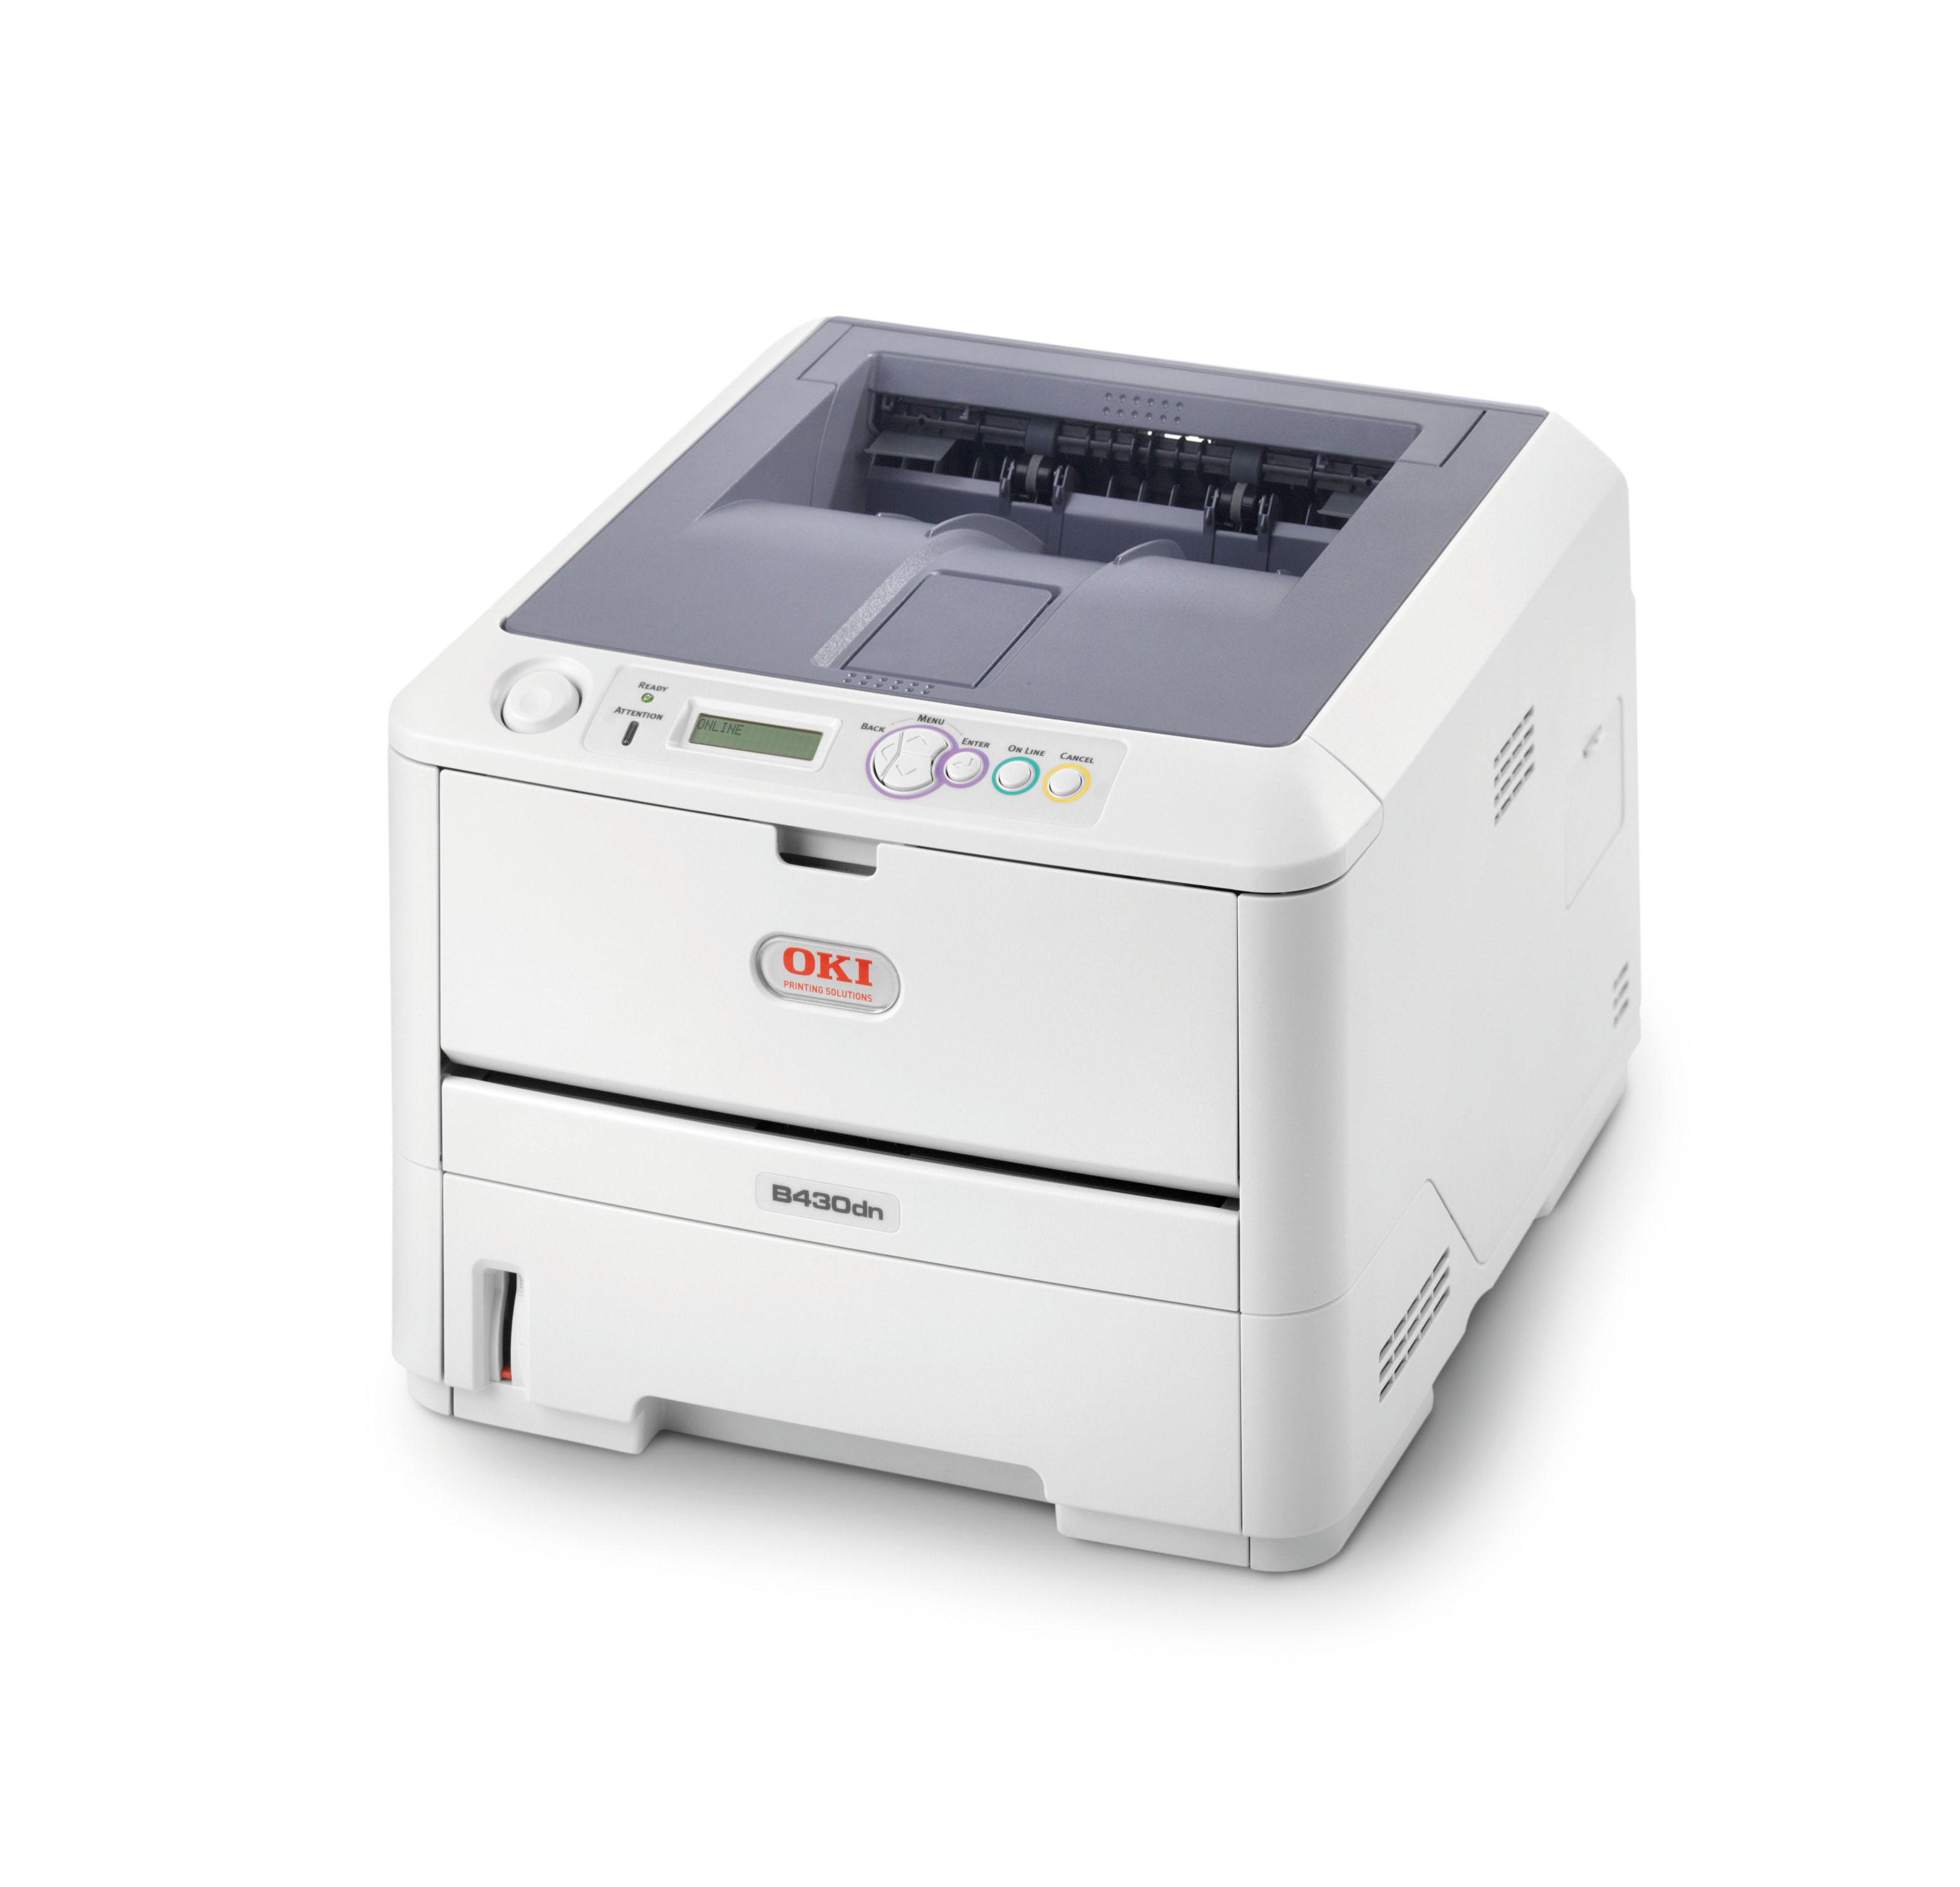 Oki Okidata B430d Printer 43984905 - Refurbished